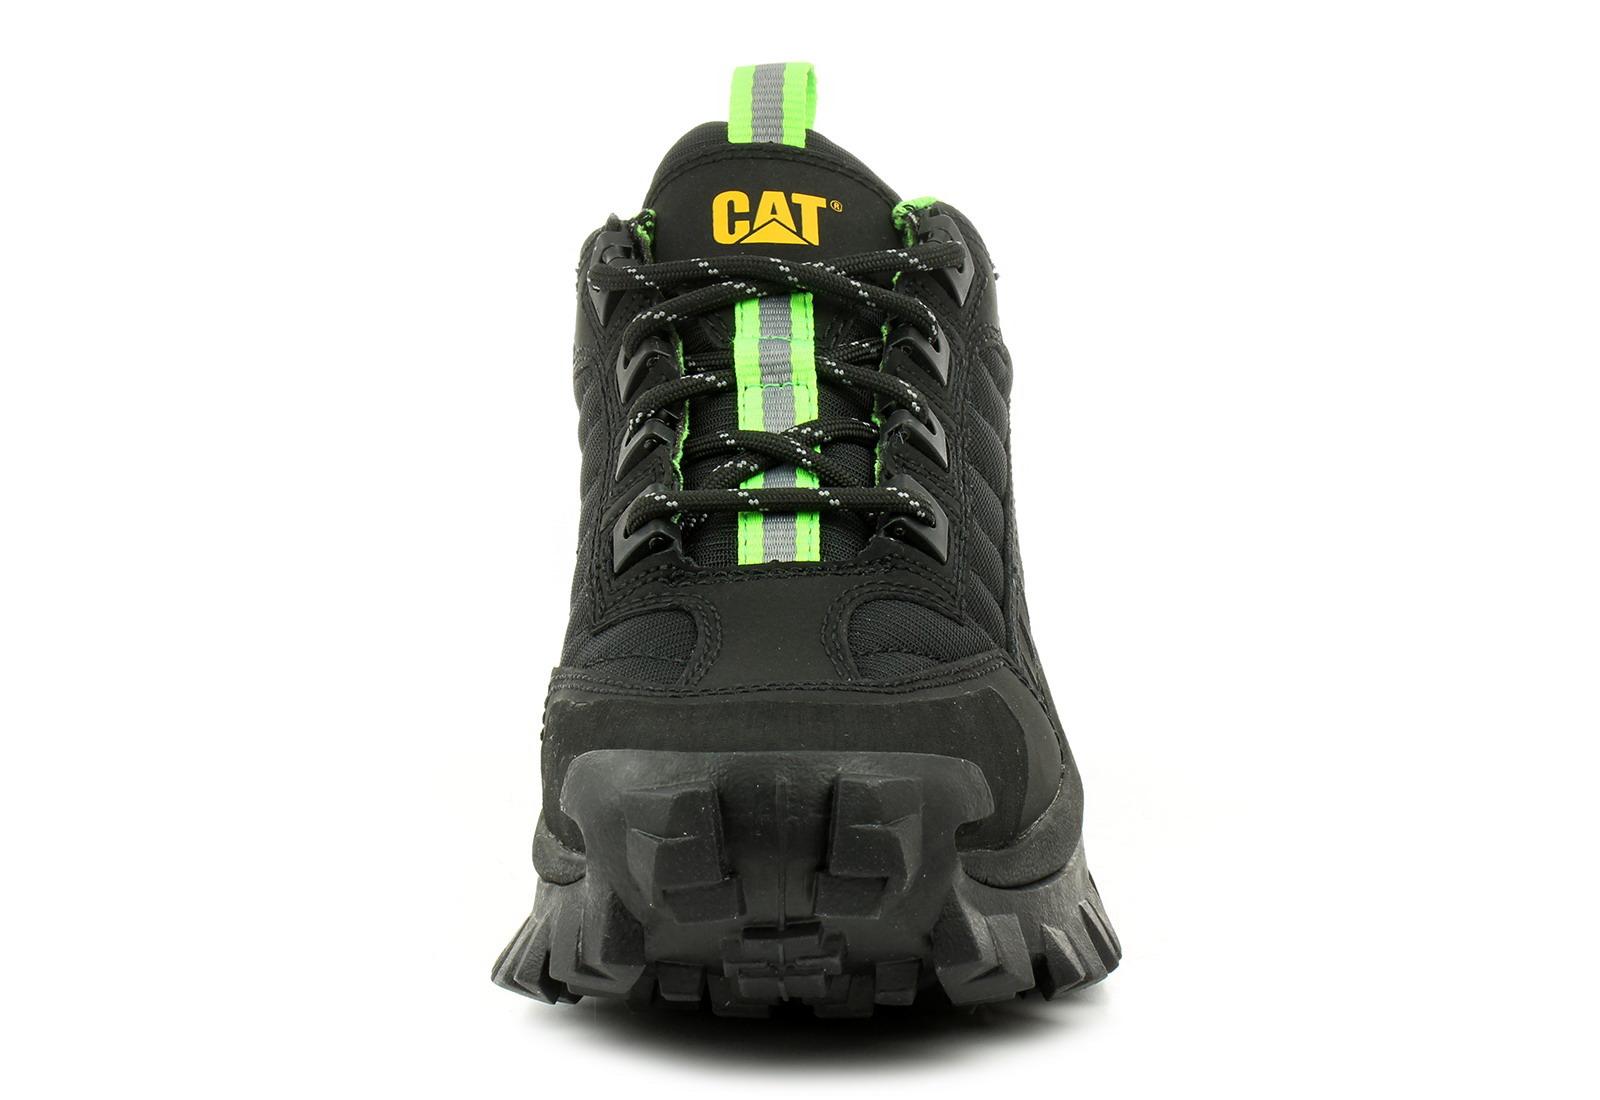 Cat Cipő - Intruder - 723312-blk - Office Shoes Magyarország e25d7a3620